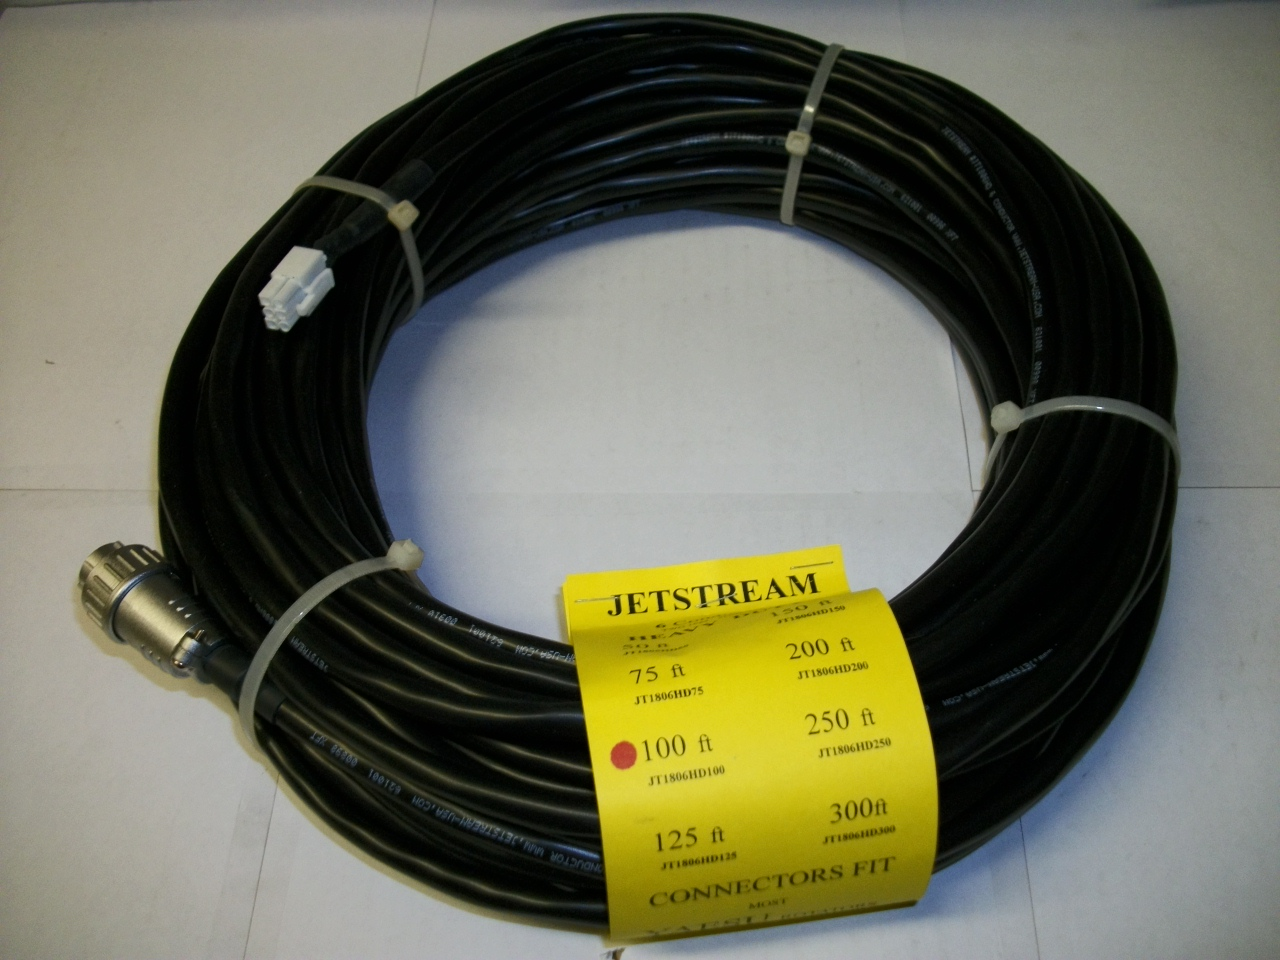 Mx 610 Diamond Mx610 13 30mhz 49 470mhz So239 Pl259 W Cables Yaesu G 1000dxc Circuit Diagram Jetstream Jt1806hd100 G1000dxa